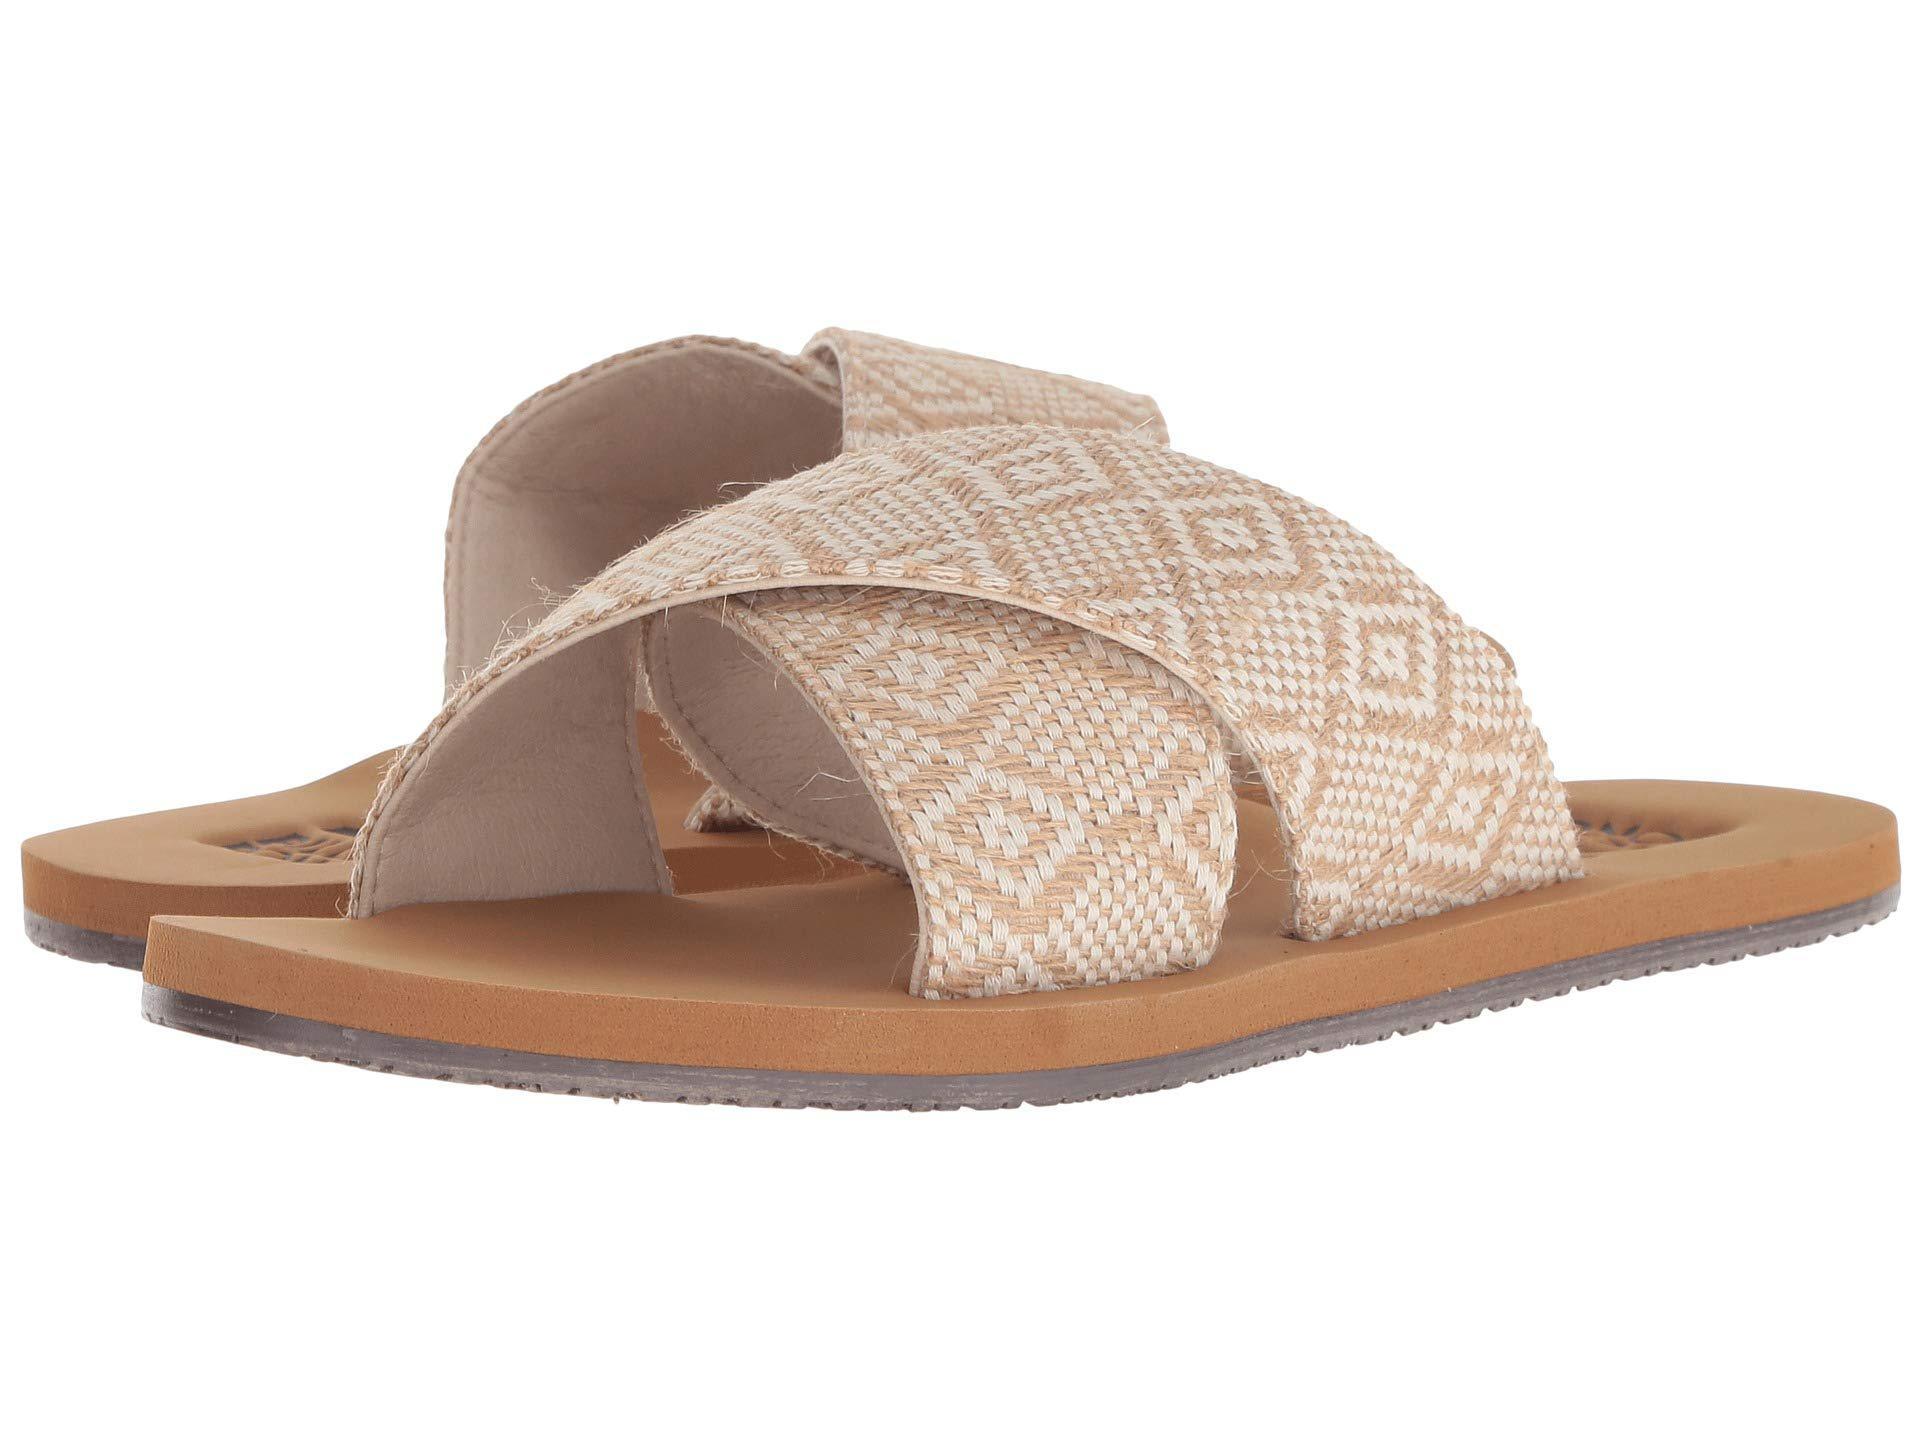 0ddc07197 Lyst - Billabong Surf Bandit (cool Wip) Women s Slide Shoes